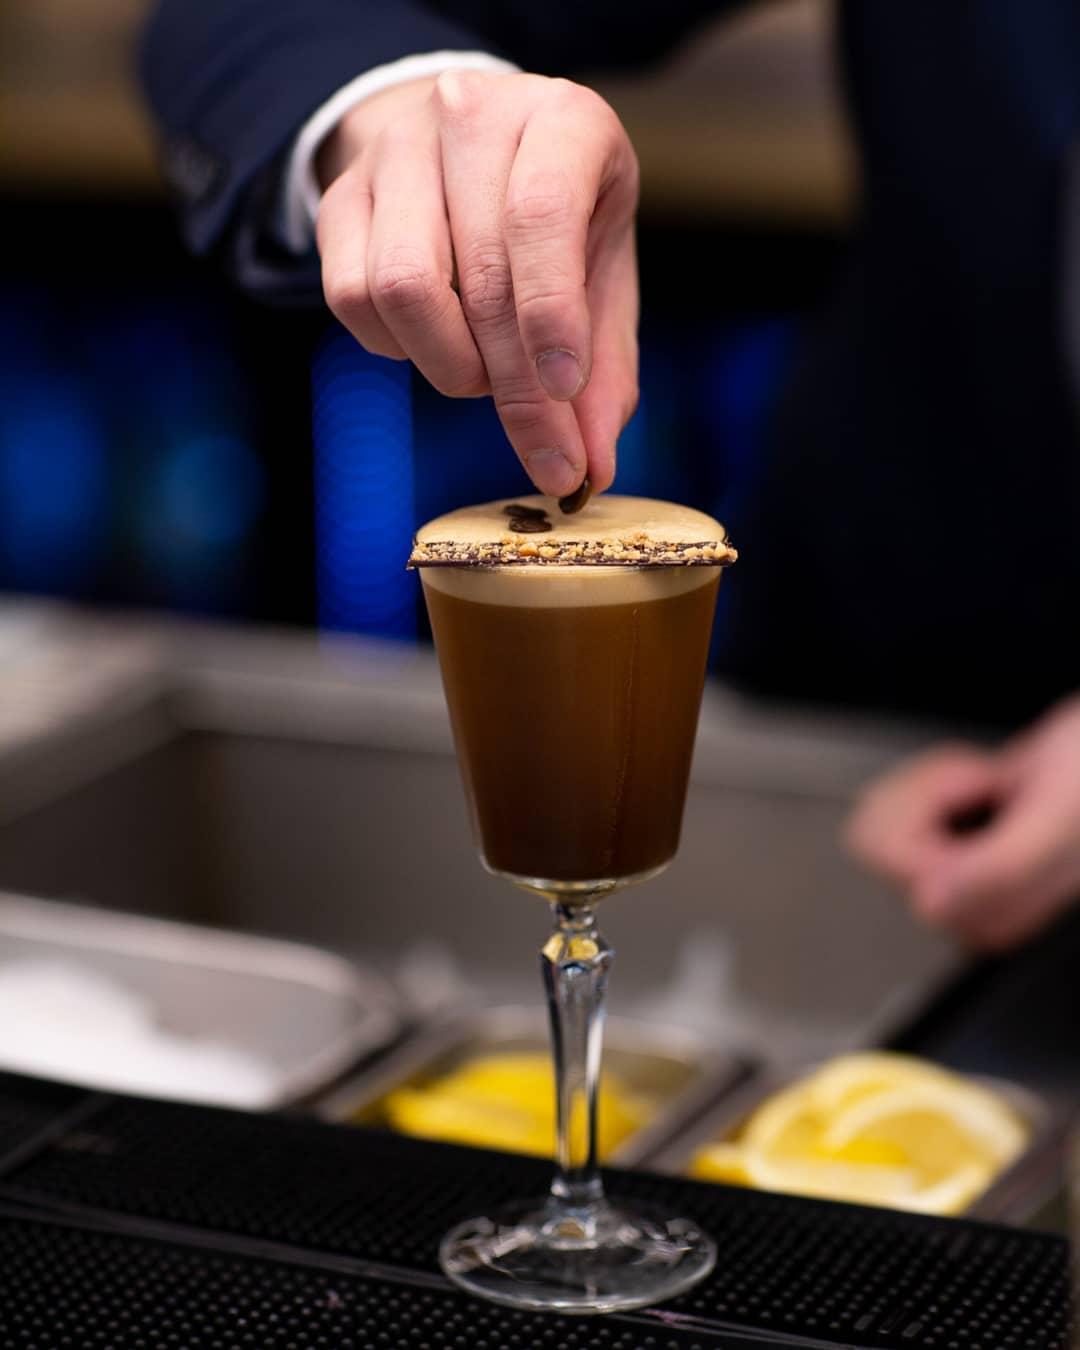 adding a coffee bean garnish onto an espresso martini